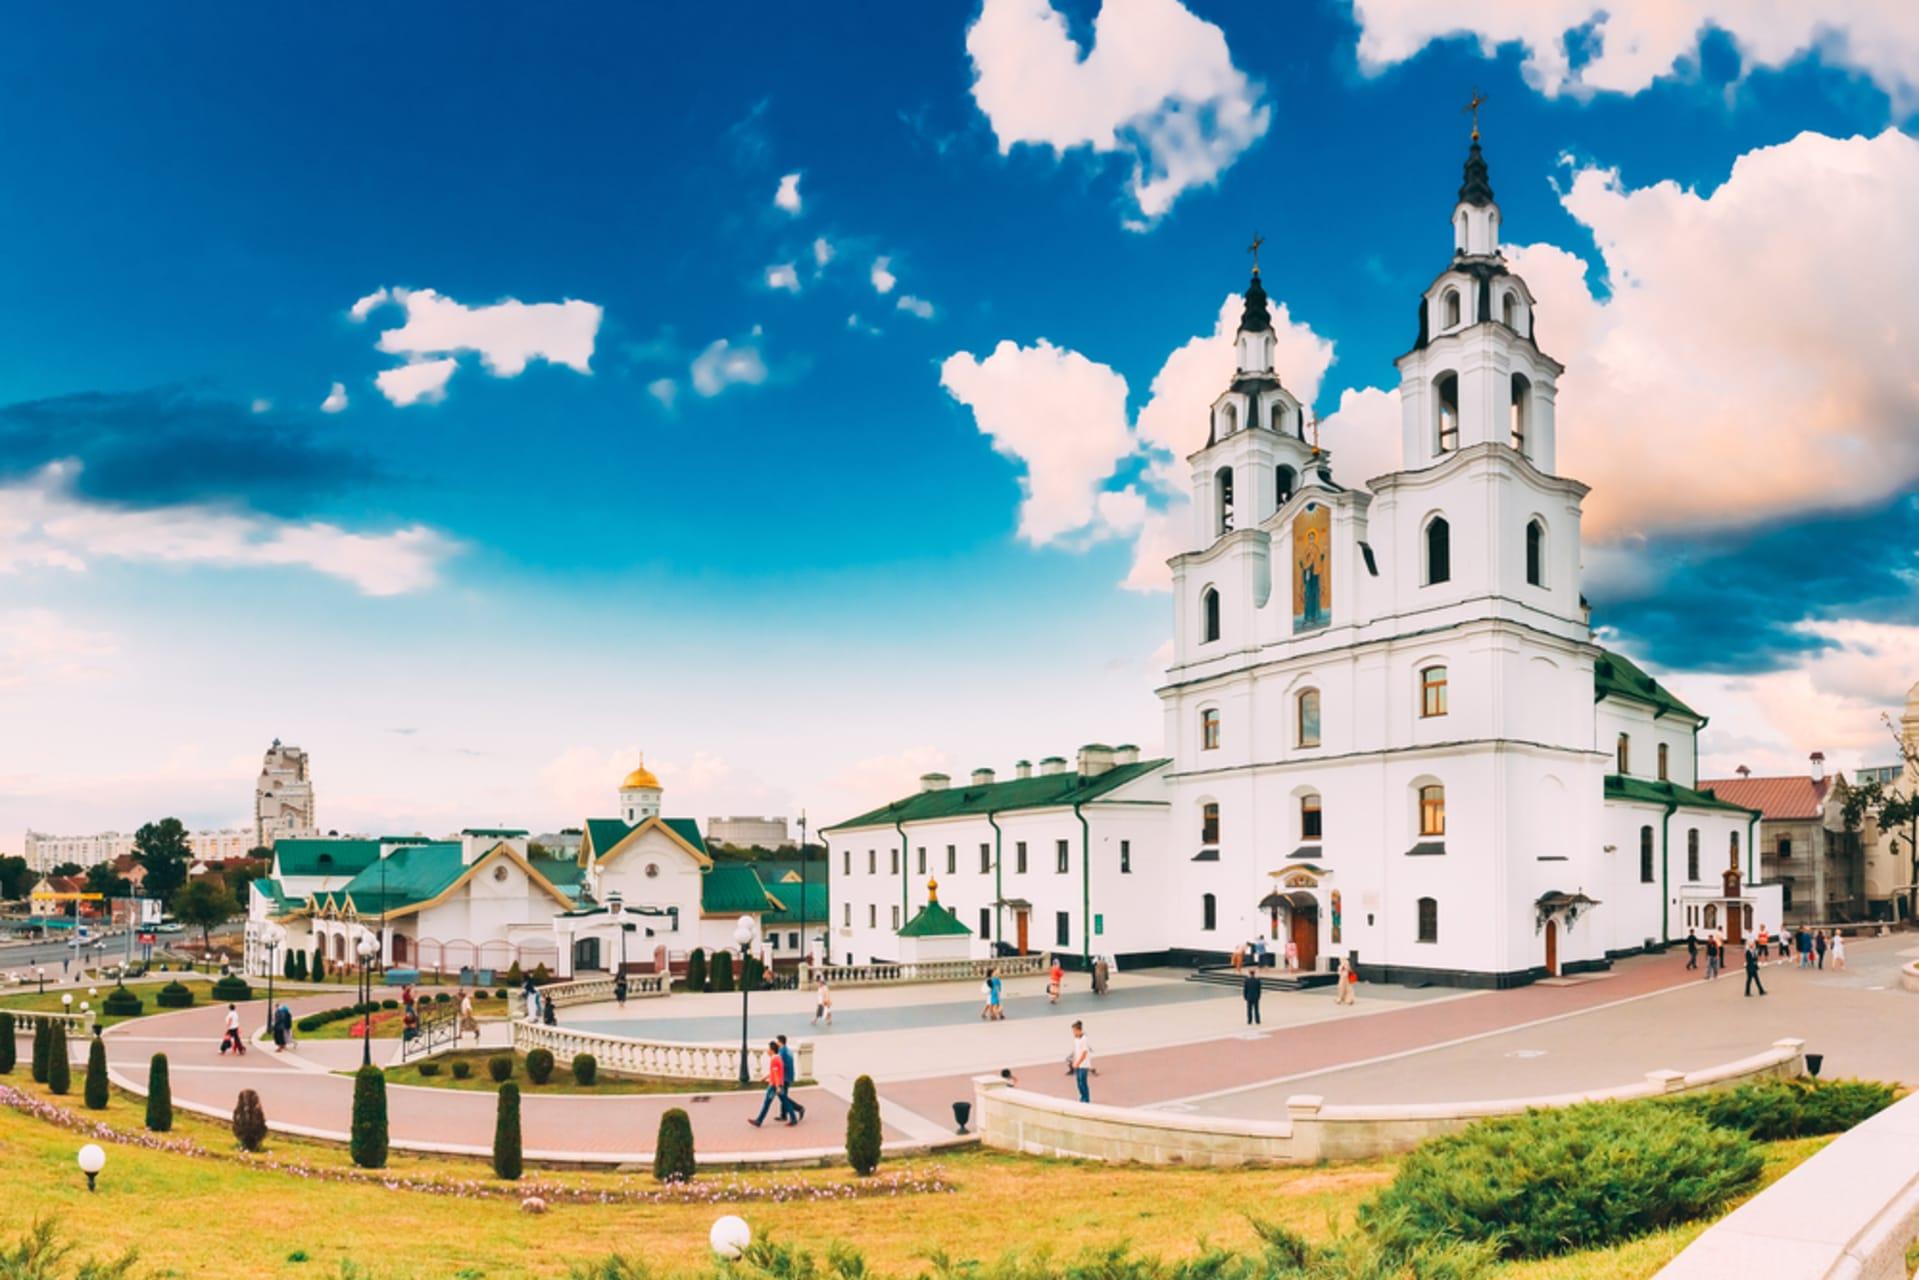 Minsk - Historical Centre Of Minsk Part I